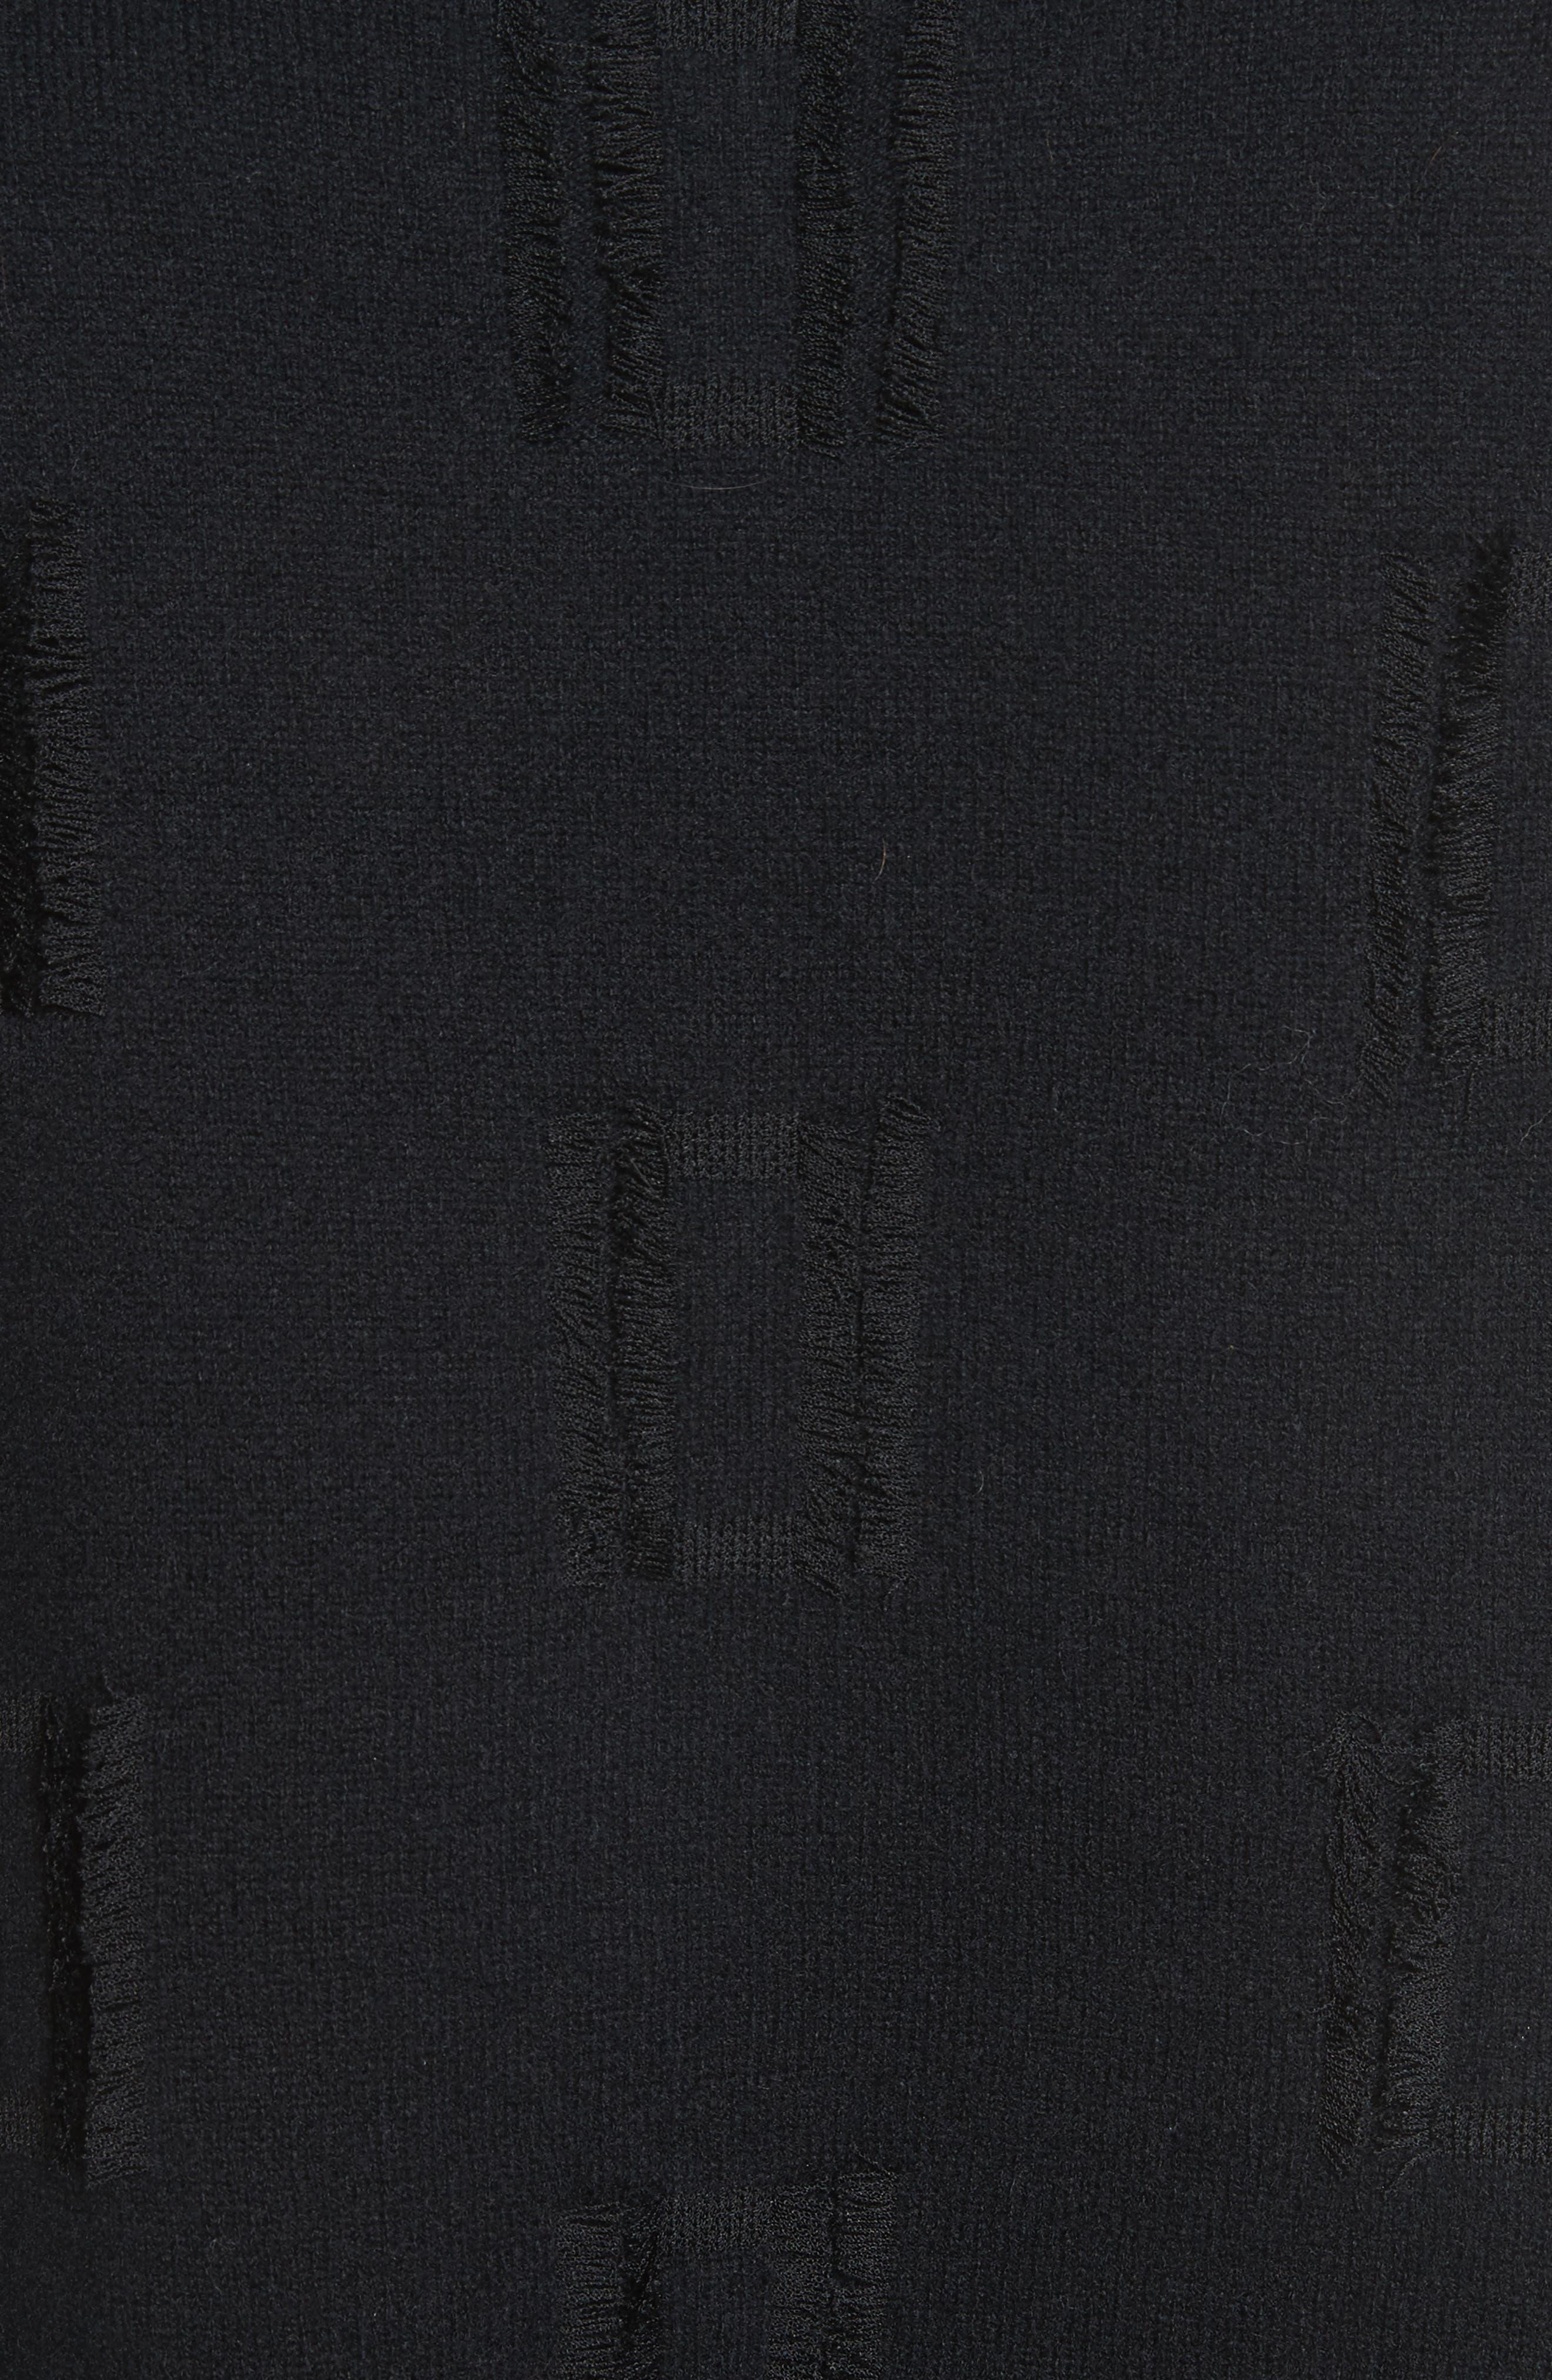 Fringe Trim Turtleneck Sweater,                             Alternate thumbnail 5, color,                             001